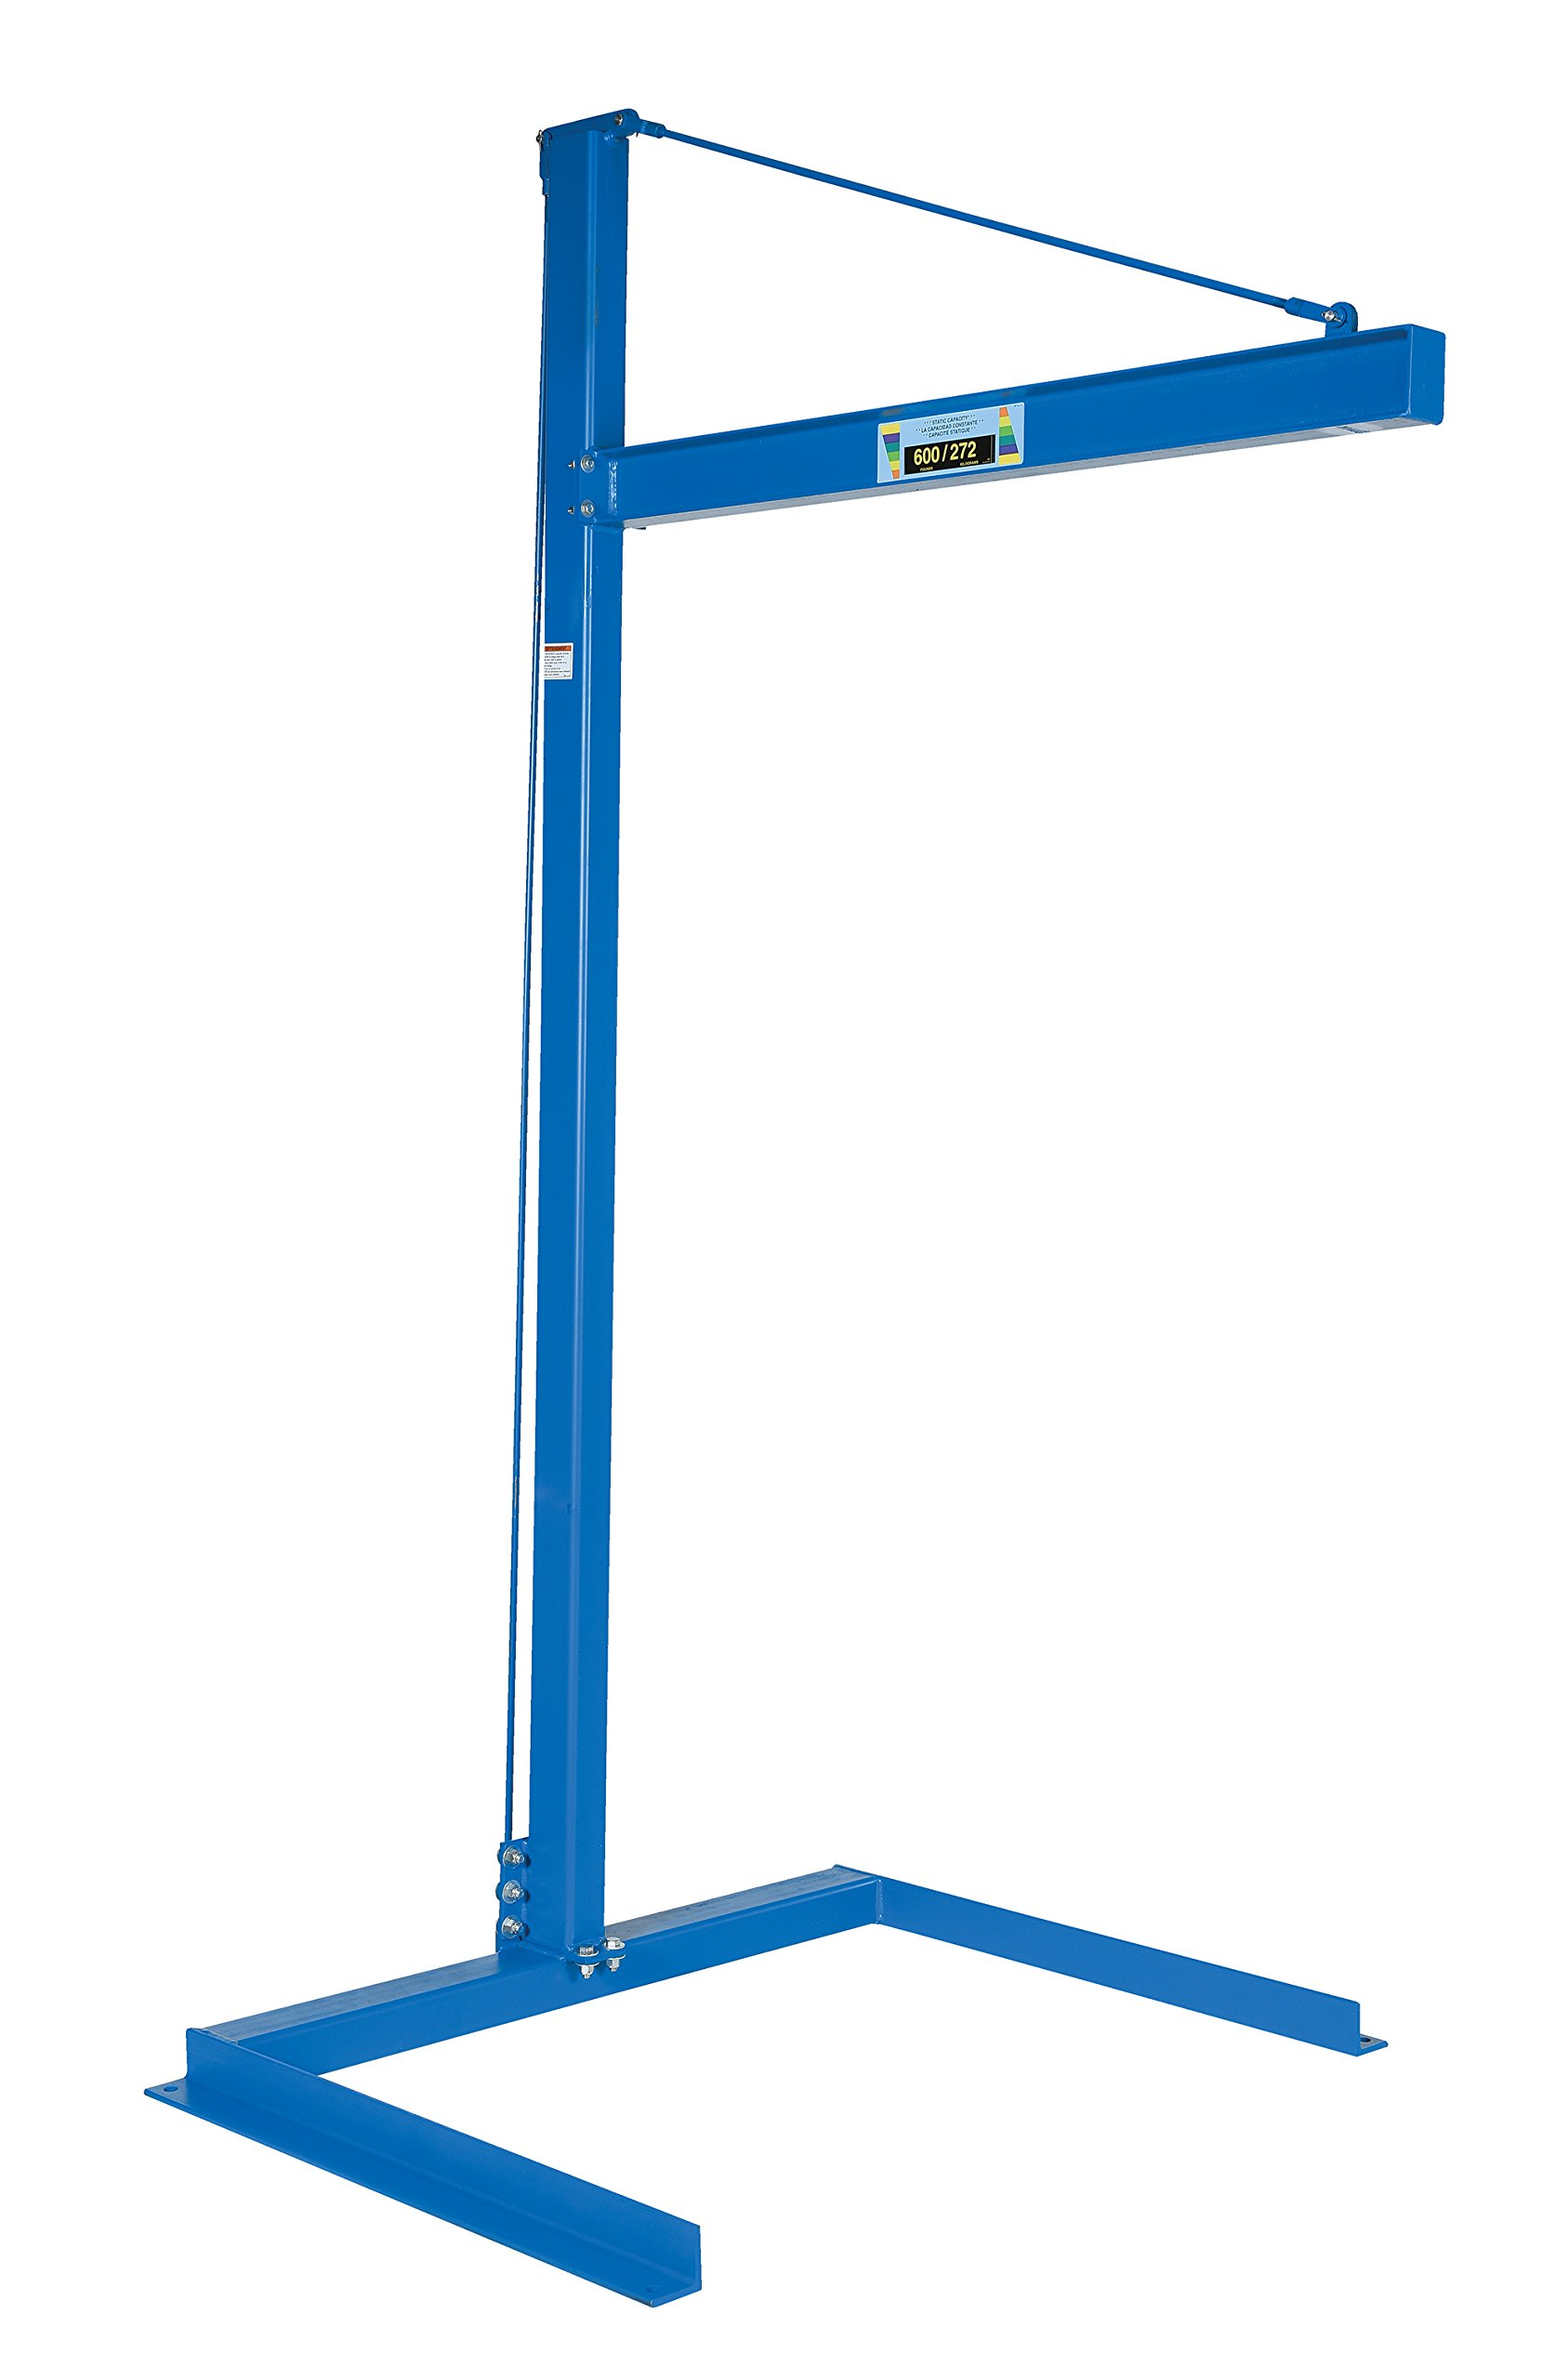 Vestil CJIB-6 Mini Overhead Cantilever Jib Crane, Freestanding, Steel, 600 lb. Capacity, 106-11/16 x 53-3/4 x 63-1/8 inches